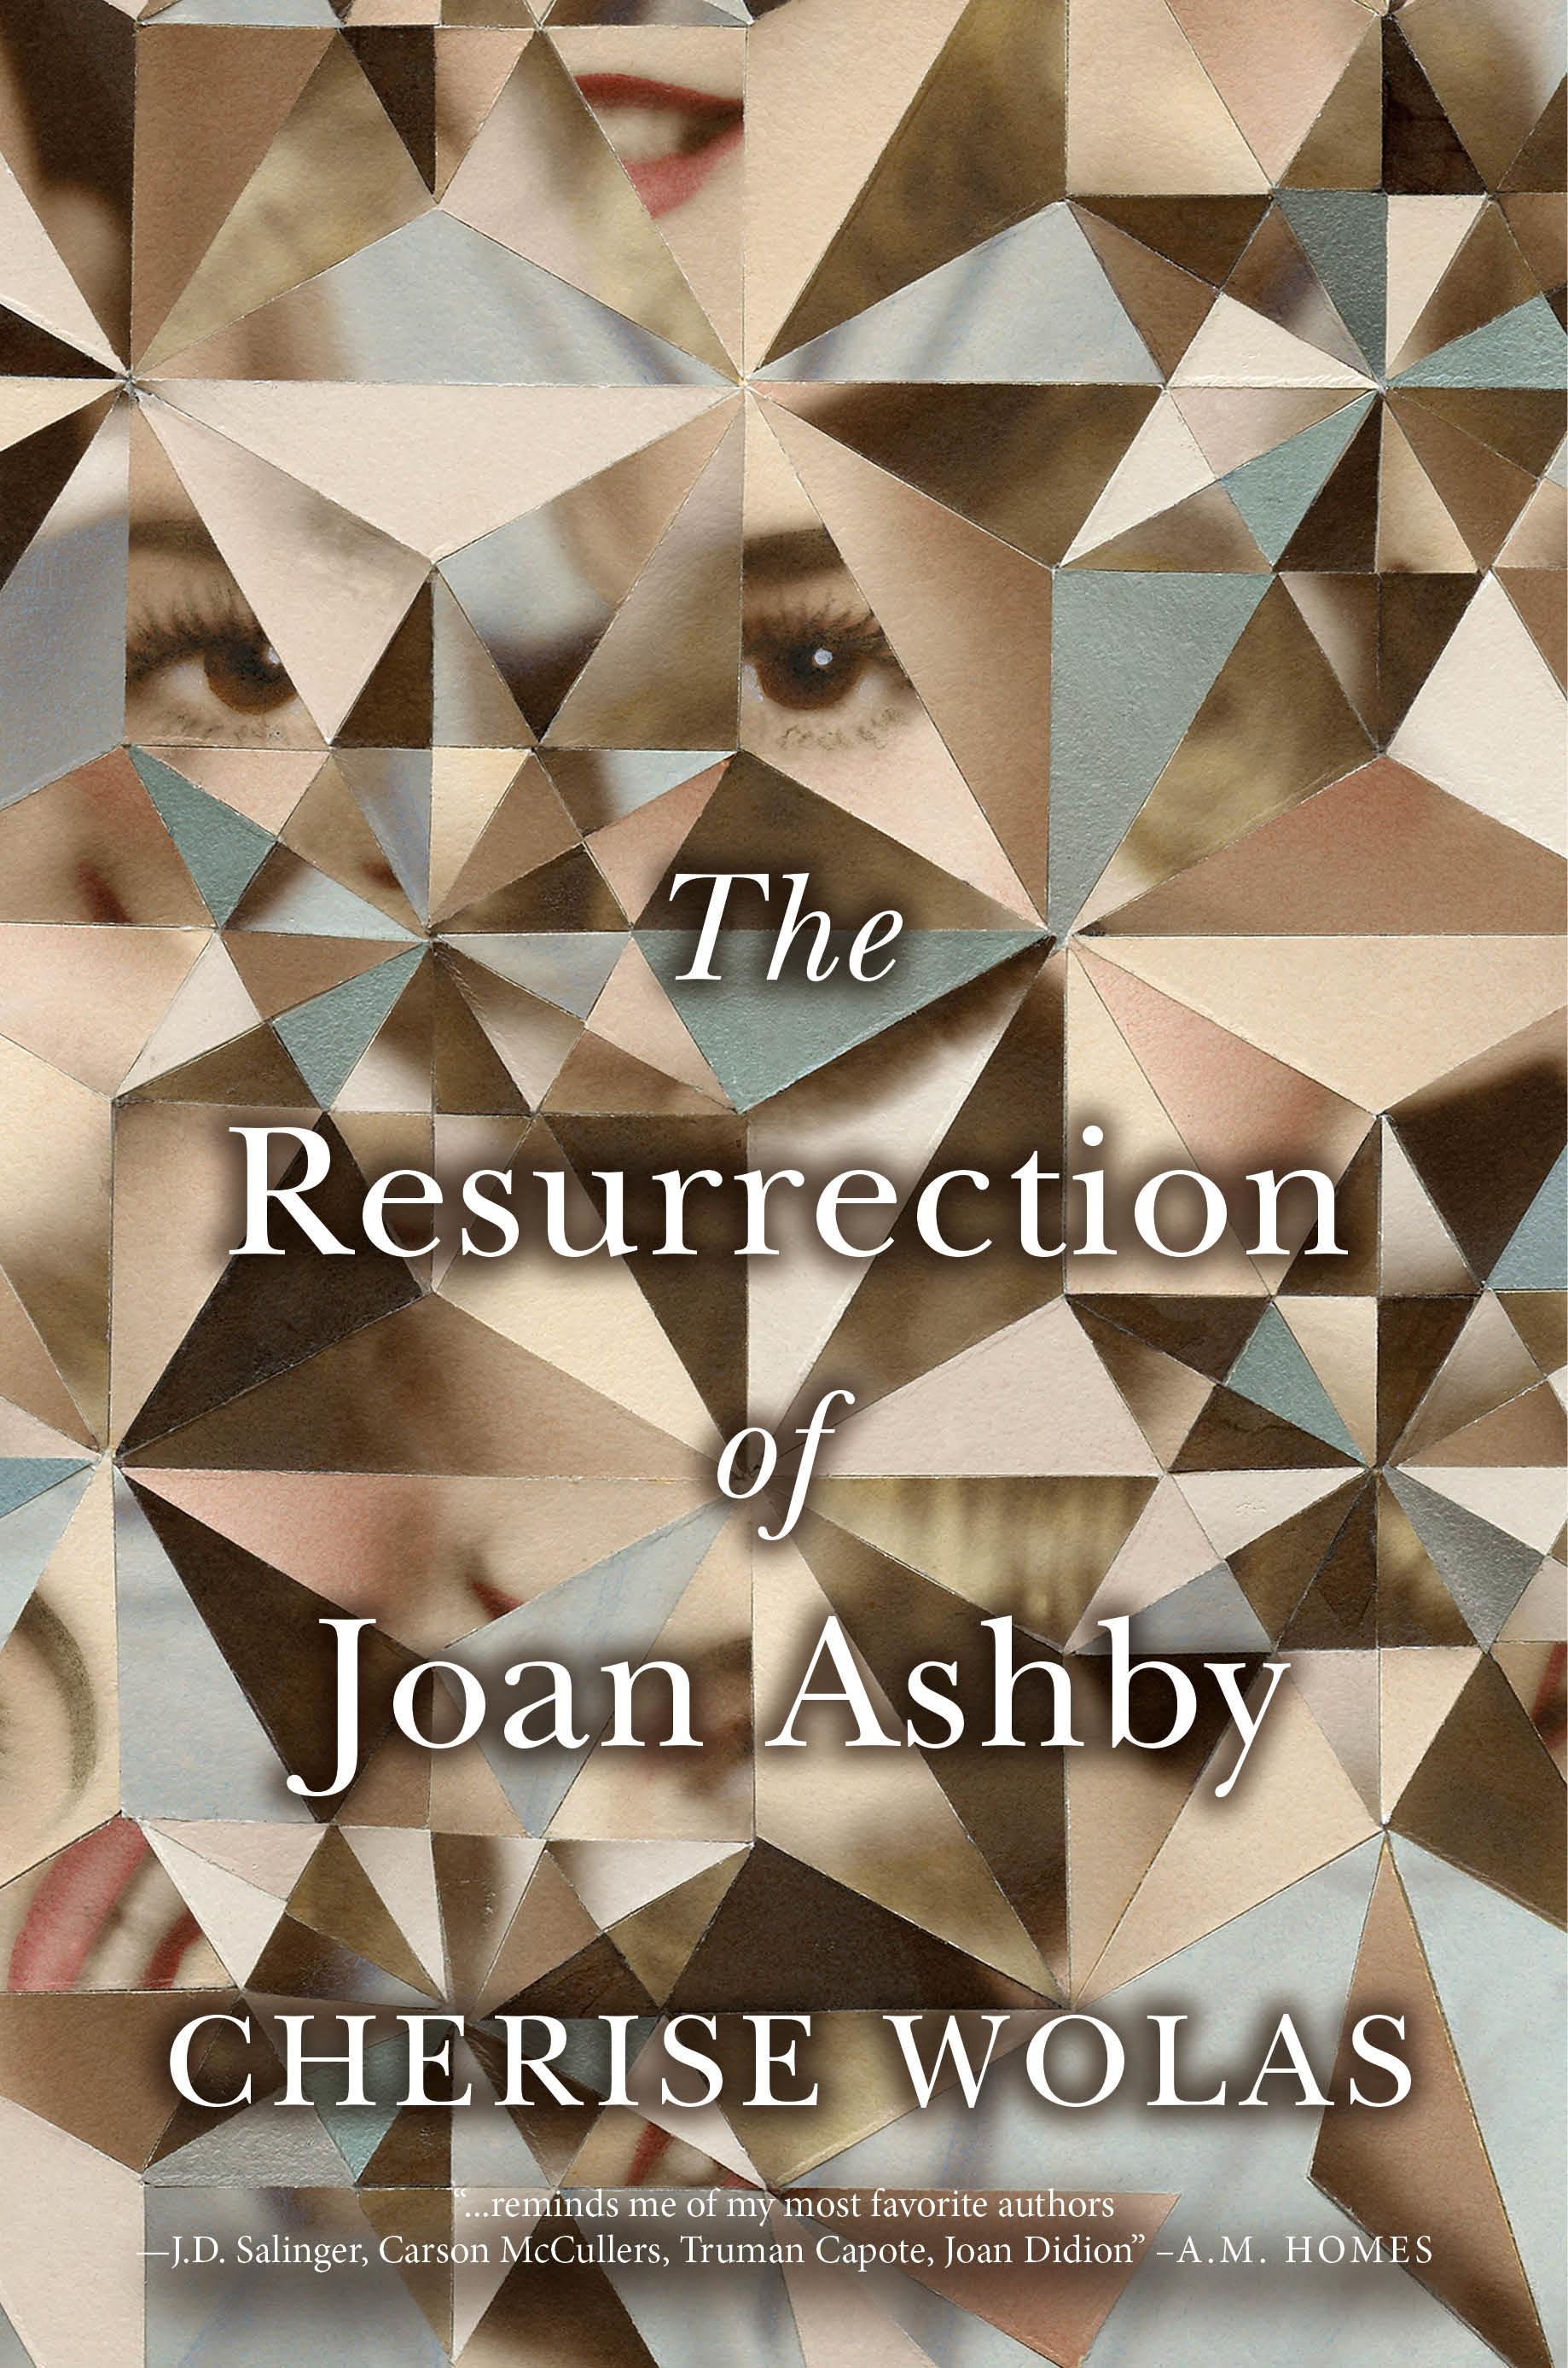 bc20508add4 The Resurrection of Joan Ashby by Cherise Wolas Flatiron Books